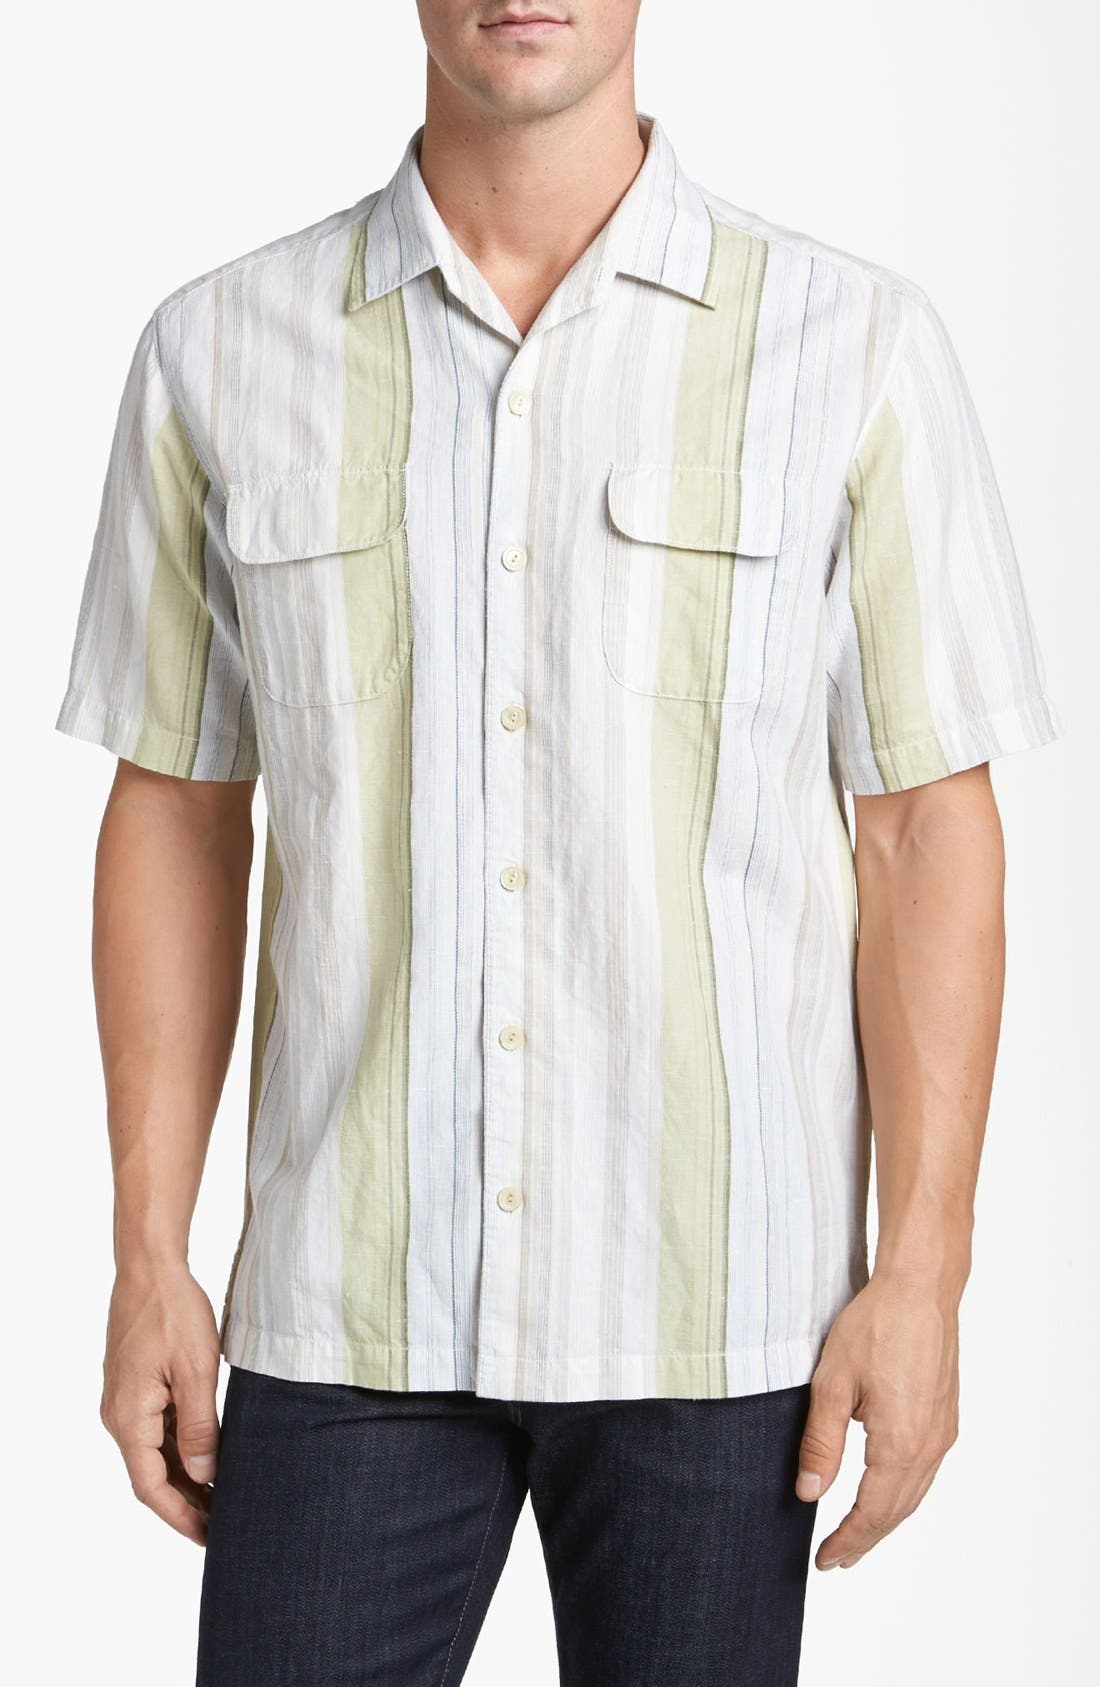 Main Image - Tommy Bahama 'Tide Garden' Linen Blend Campshirt